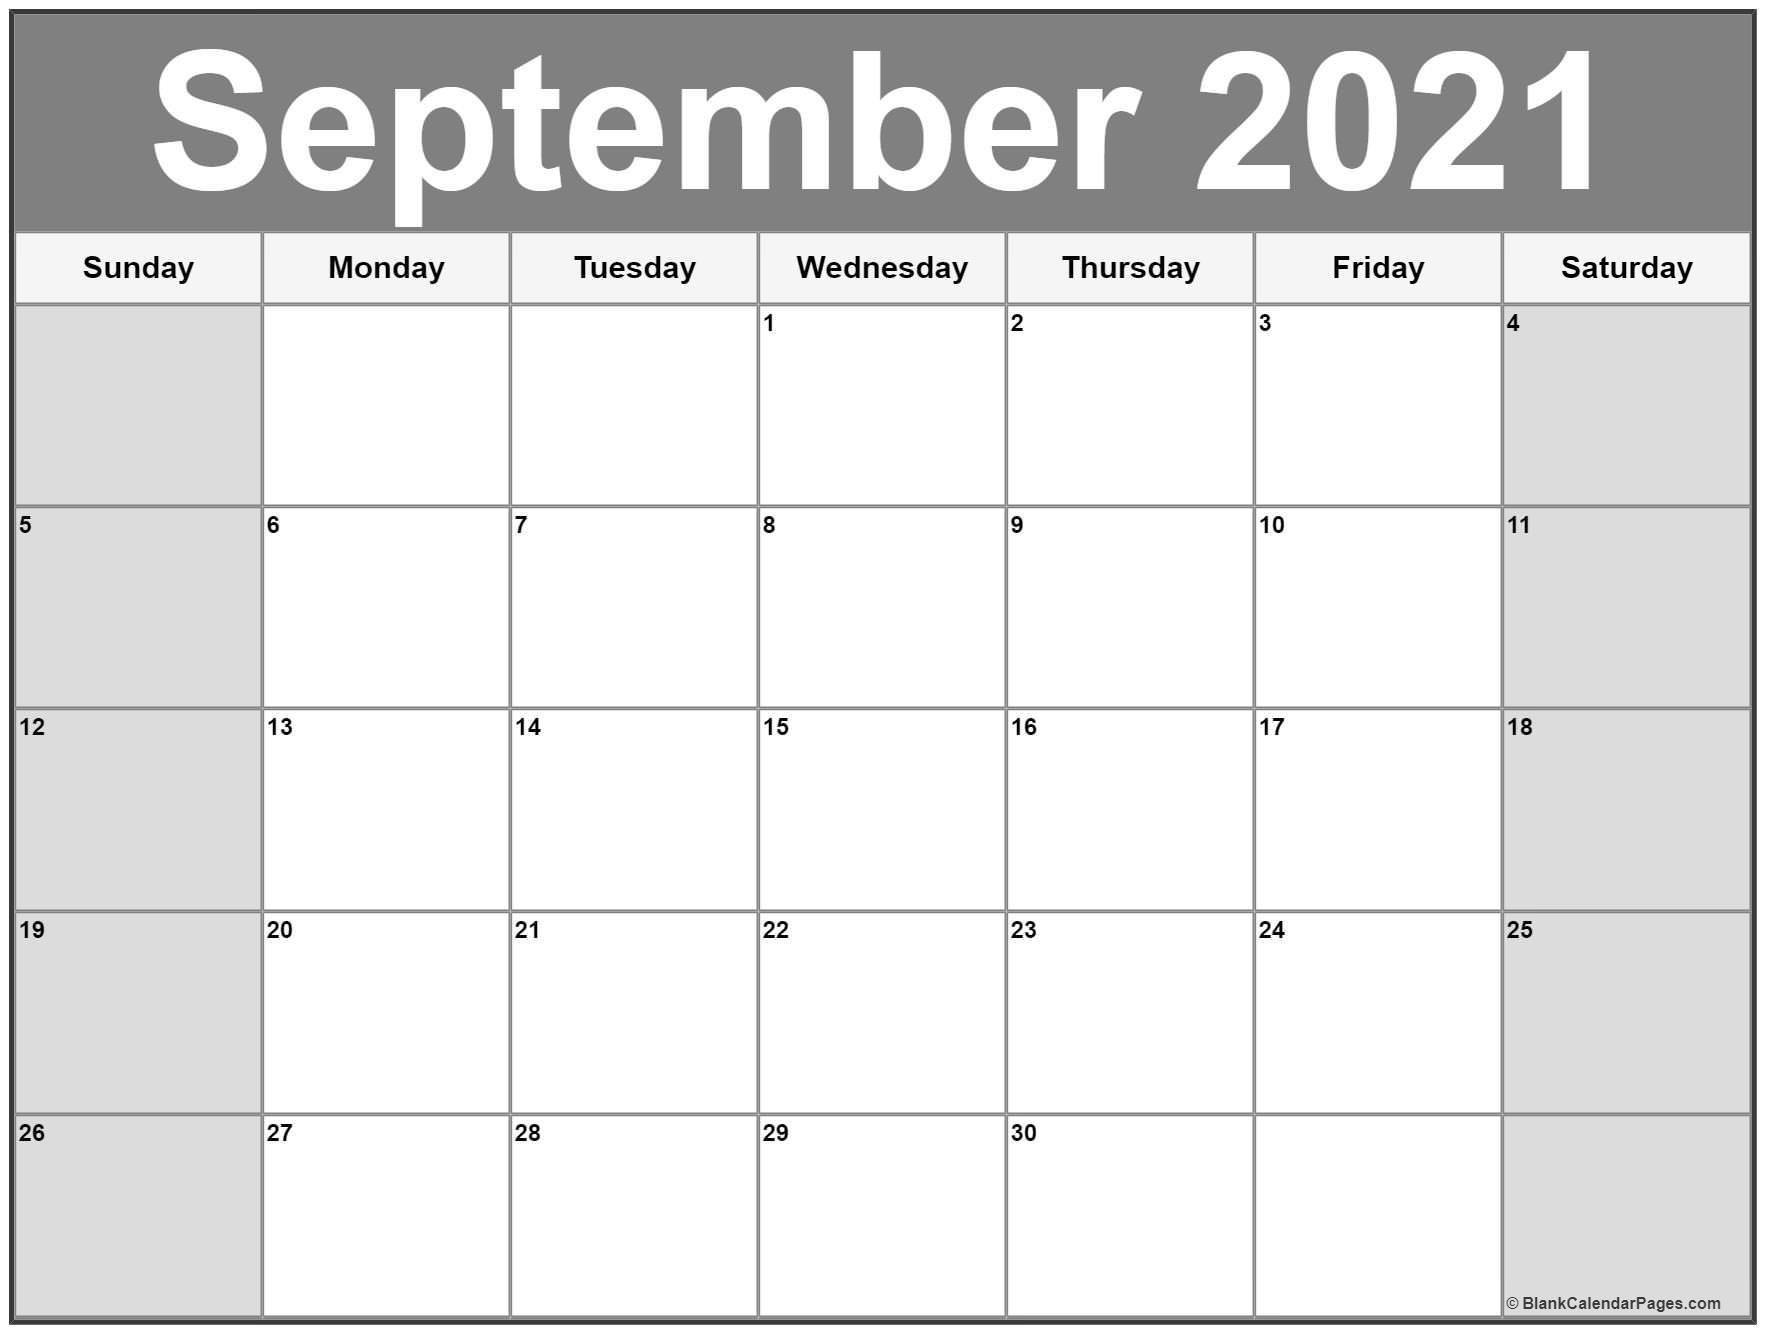 September 2021 Calendar   Free Printable Monthly Calendars-Monthly Calendar Printable October 2021